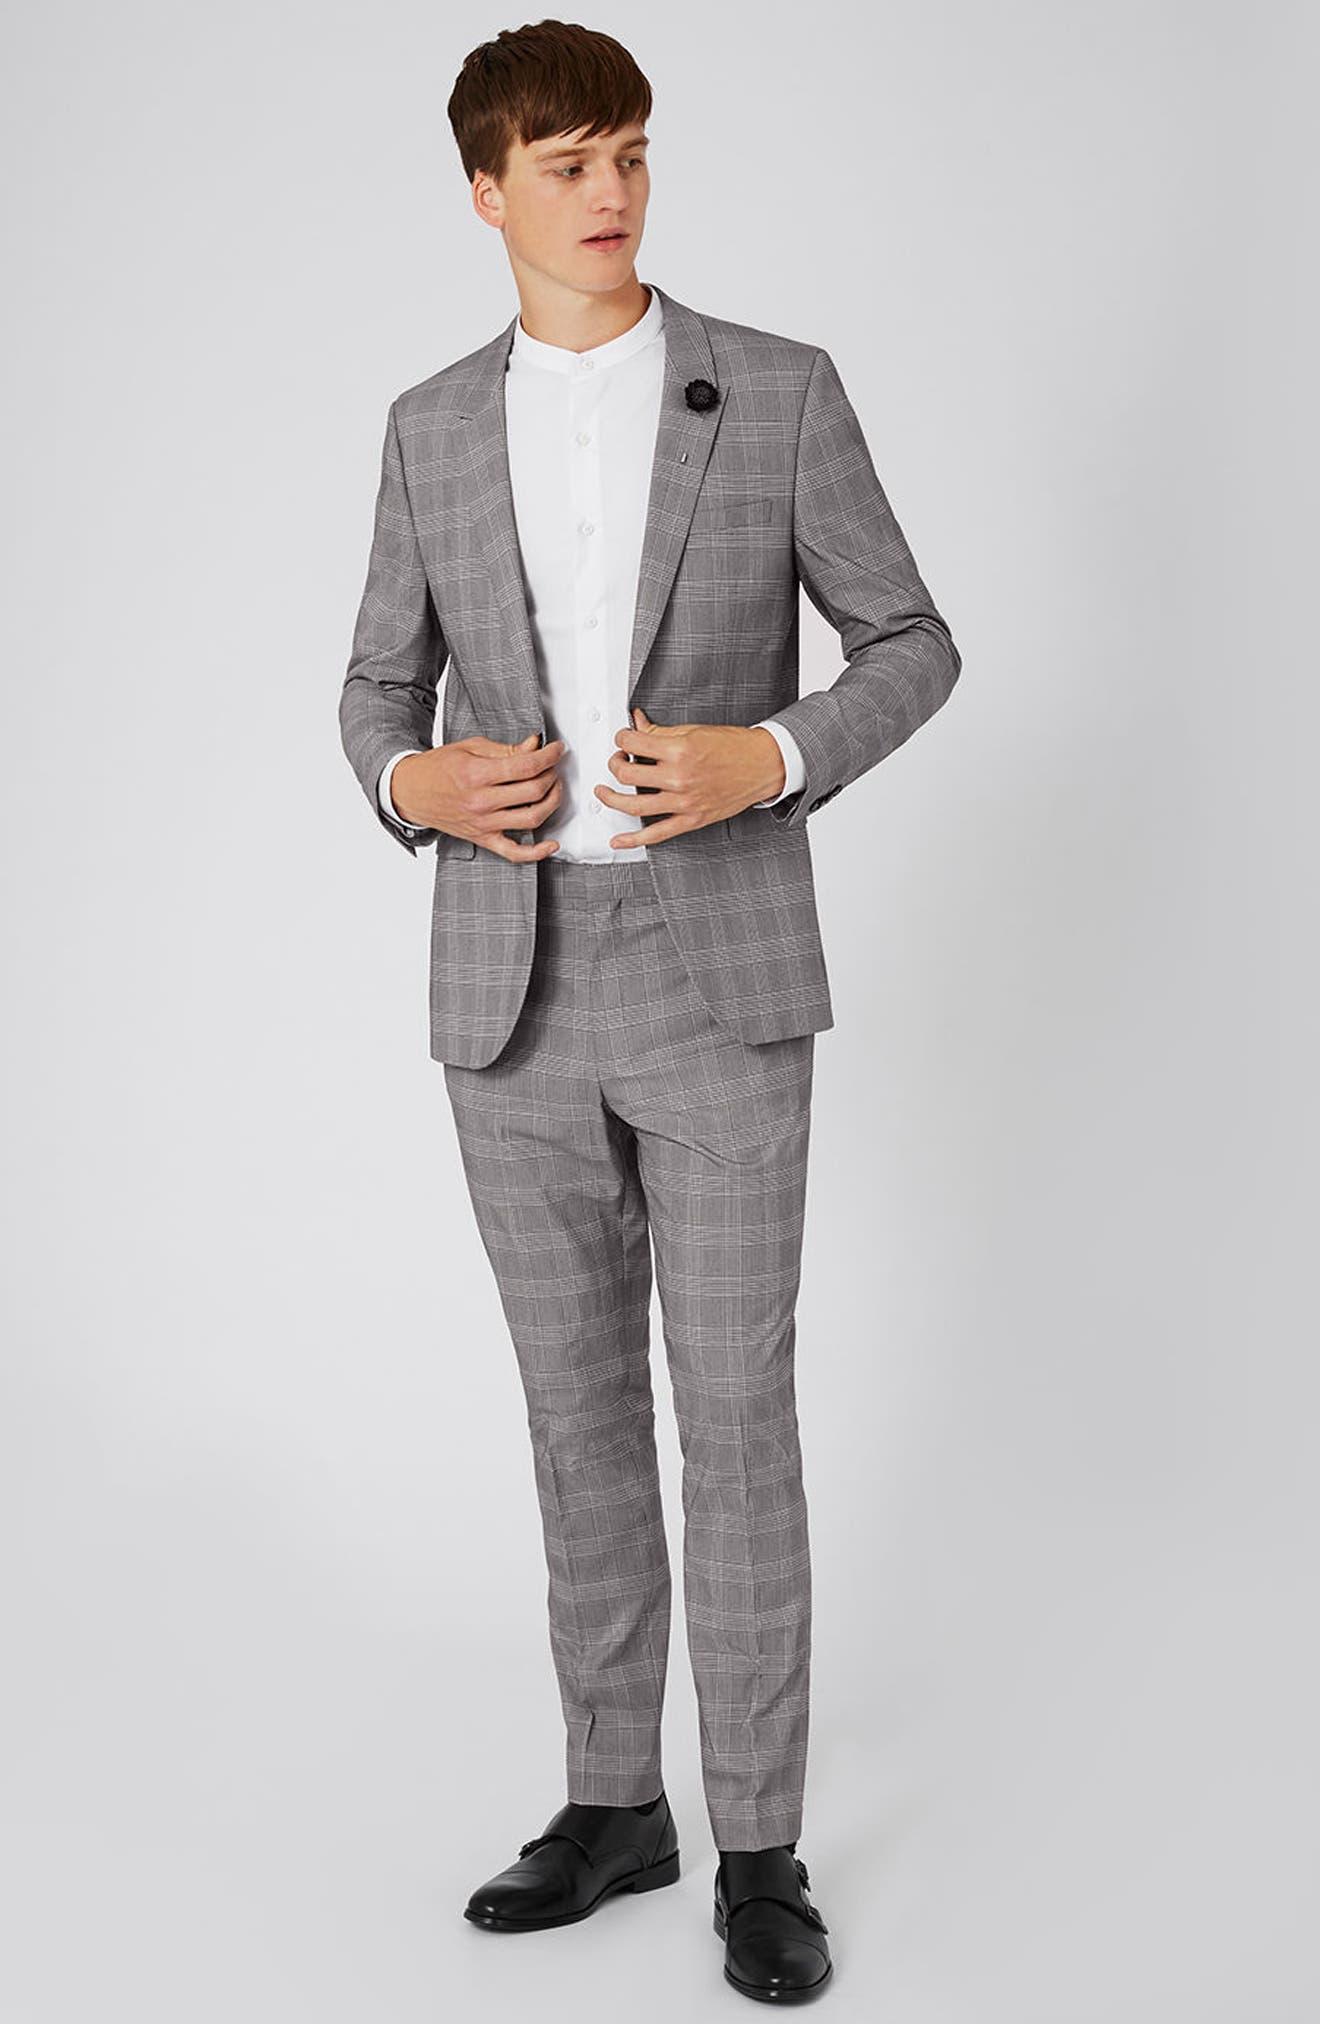 Topman Skinny Fit Suit